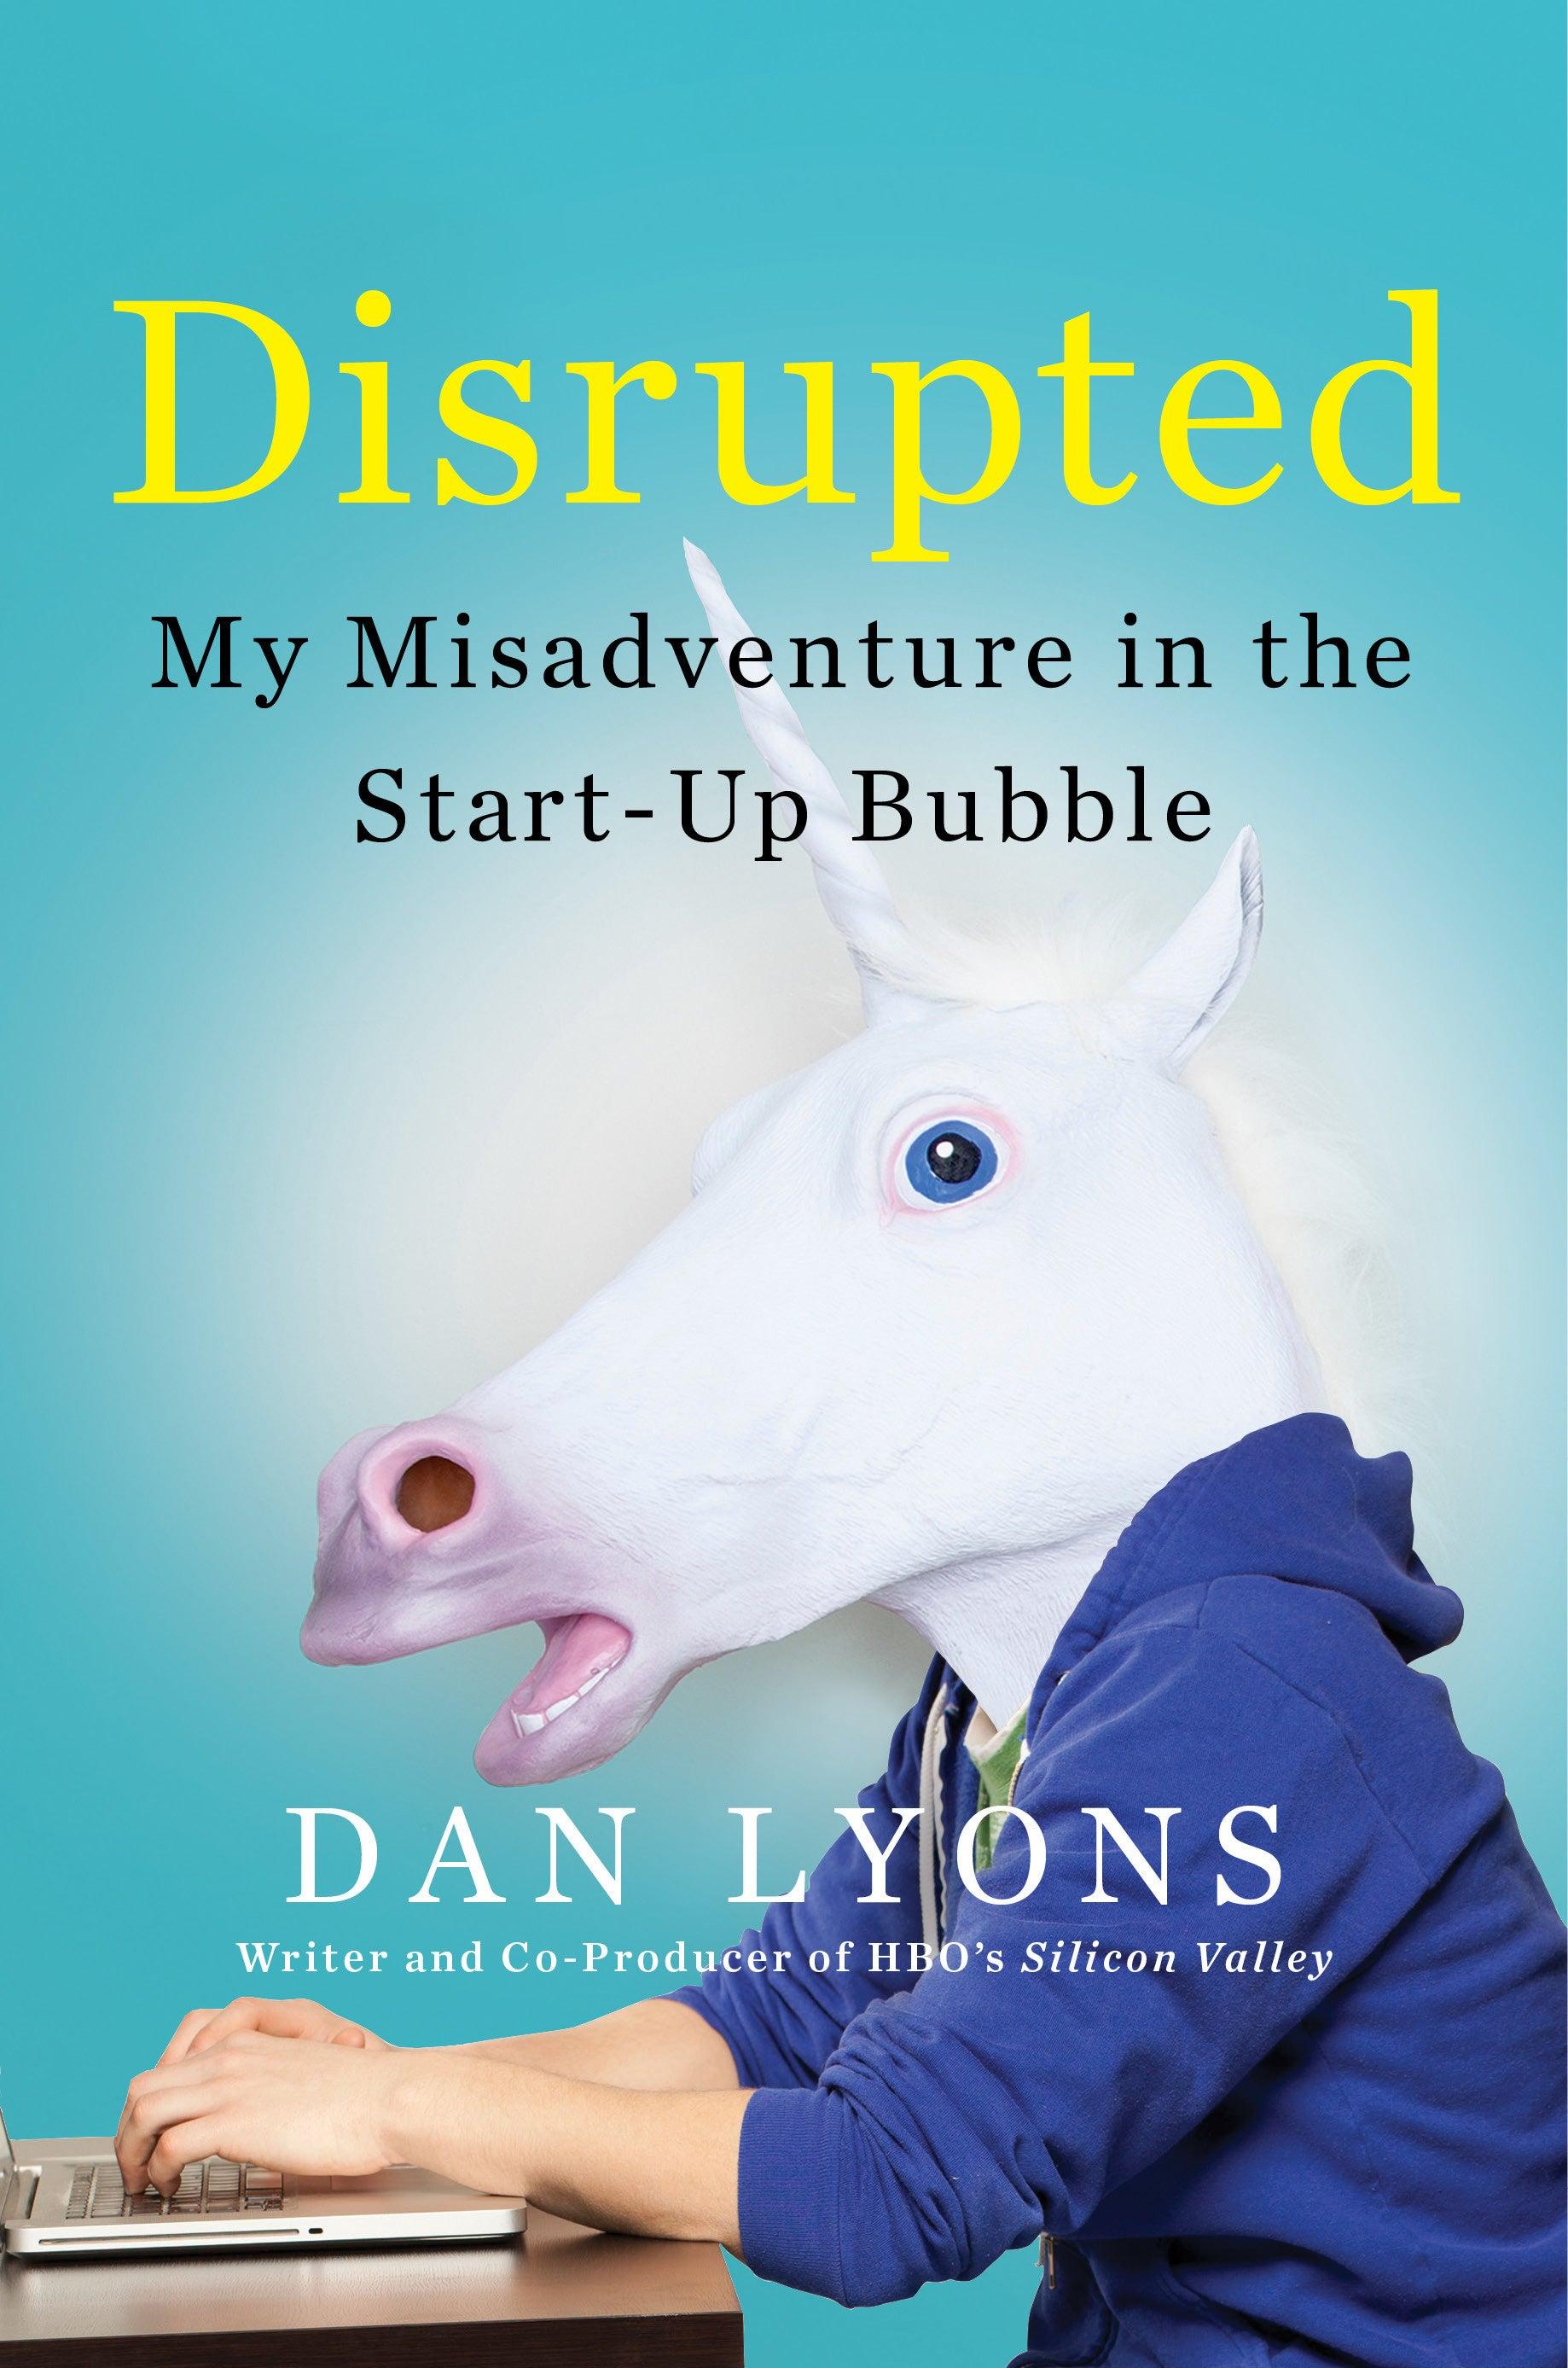 Dan Lyon's Disrupted hits stores April 5.